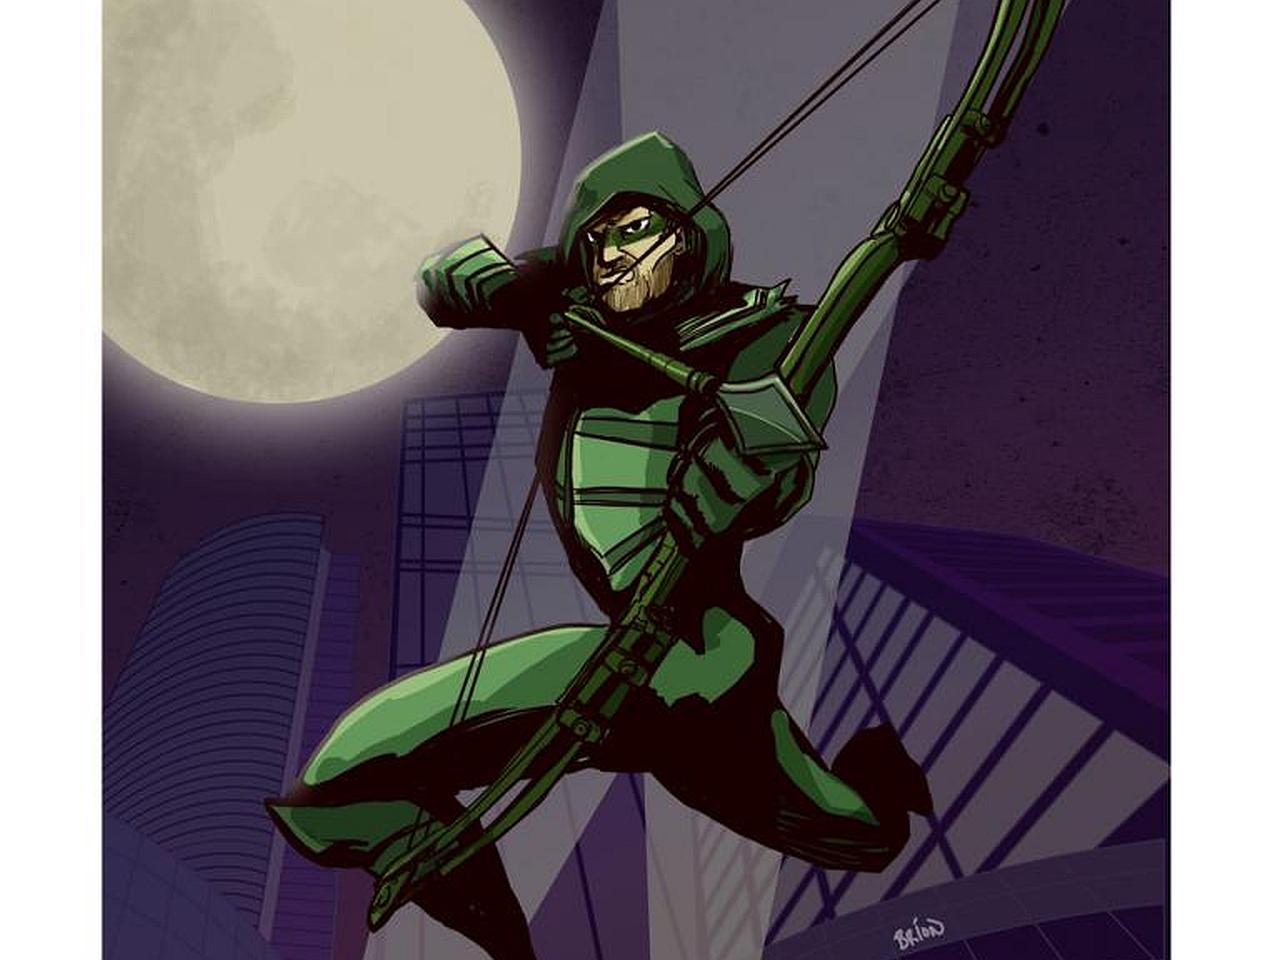 Green Arrow Computer Wallpapers Desktop Backgrounds 1280x960 ID 1280x960